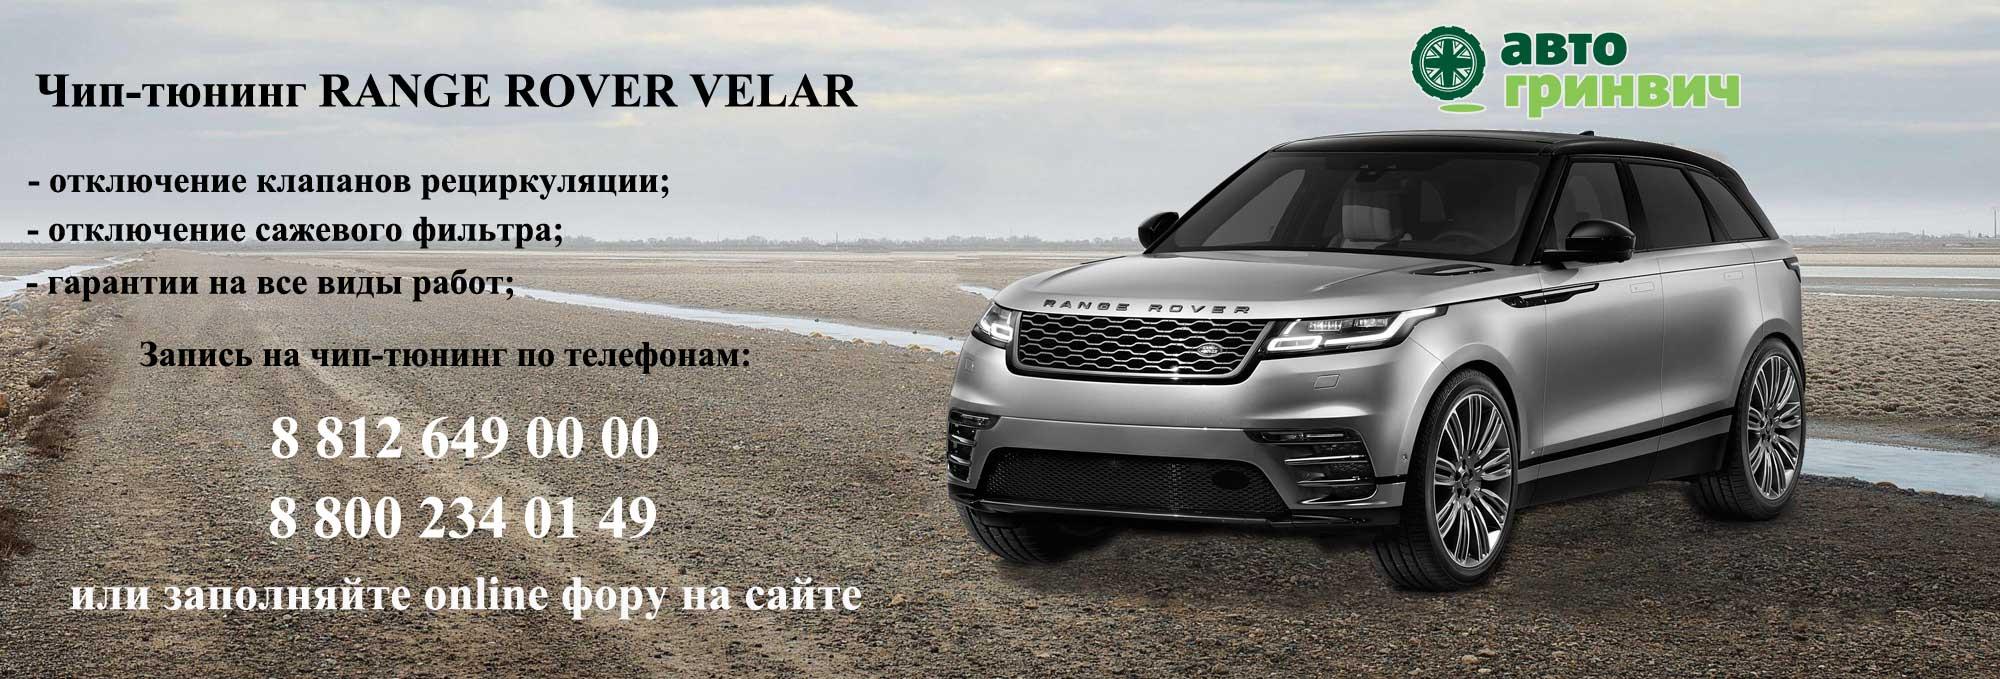 Чип-тюнинг Range Rover Velar